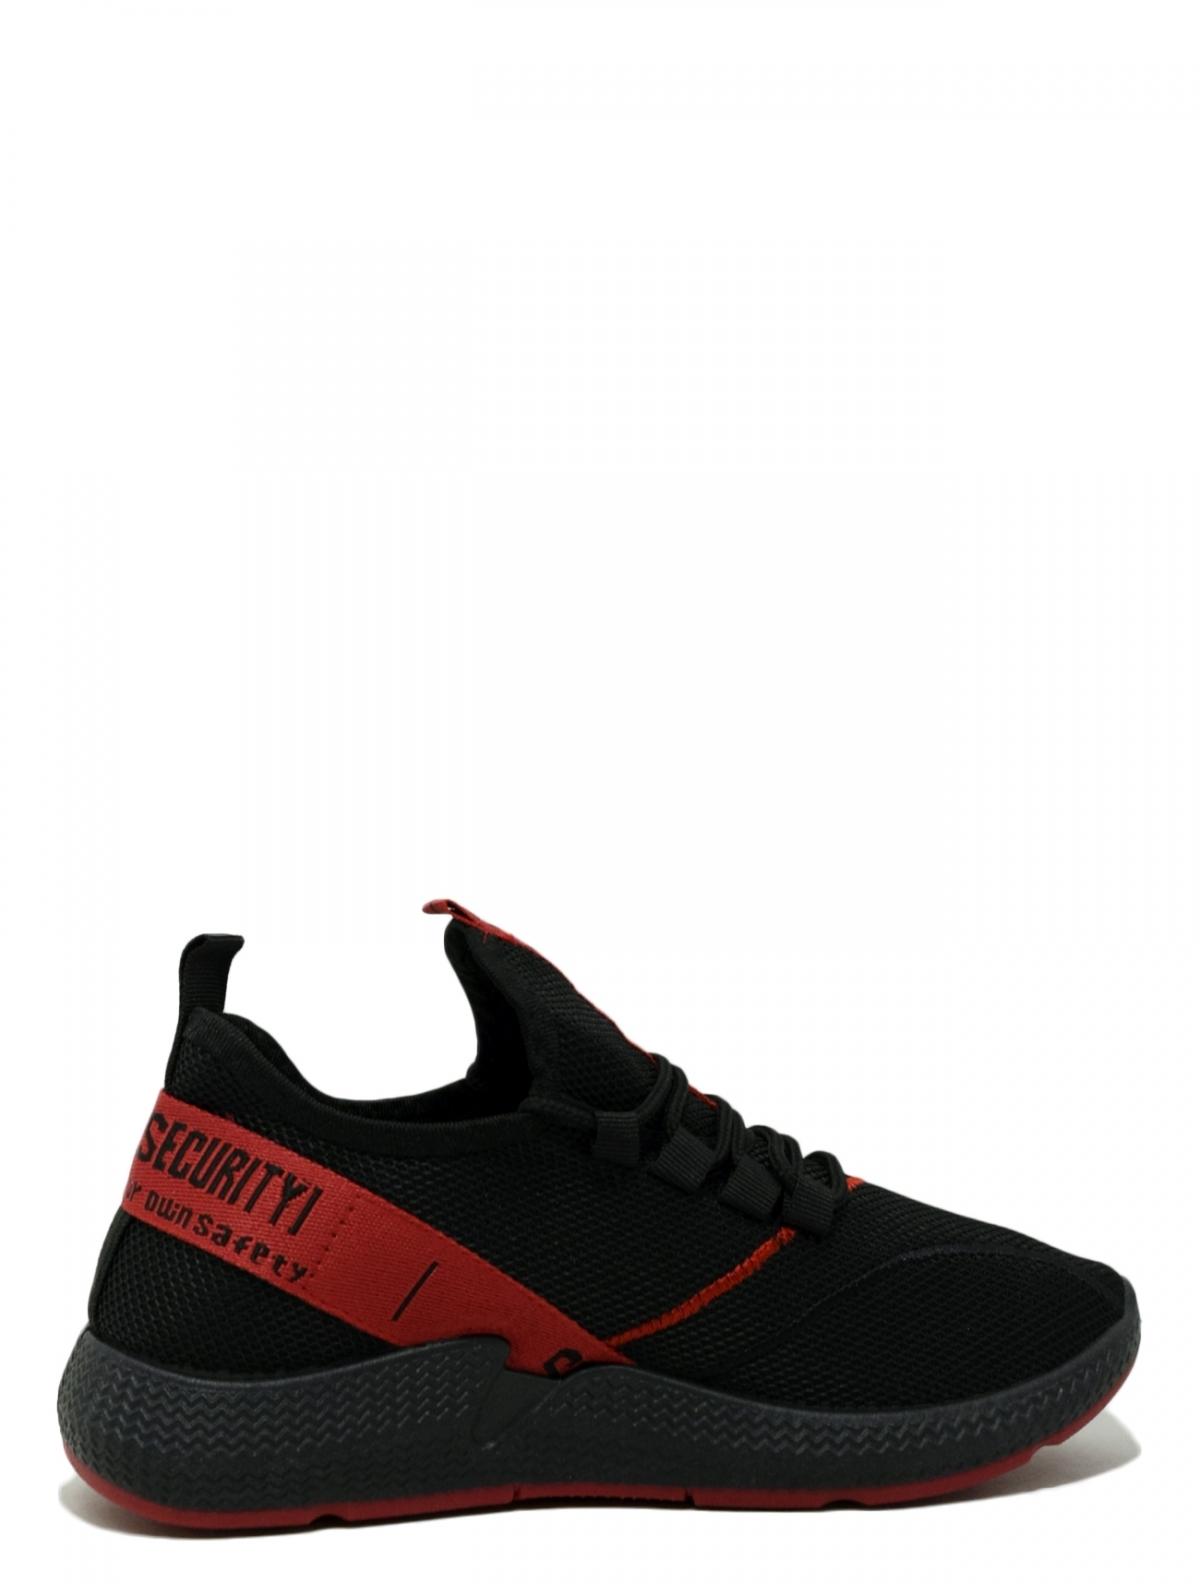 Trien ISM007-021 женские кроссовки